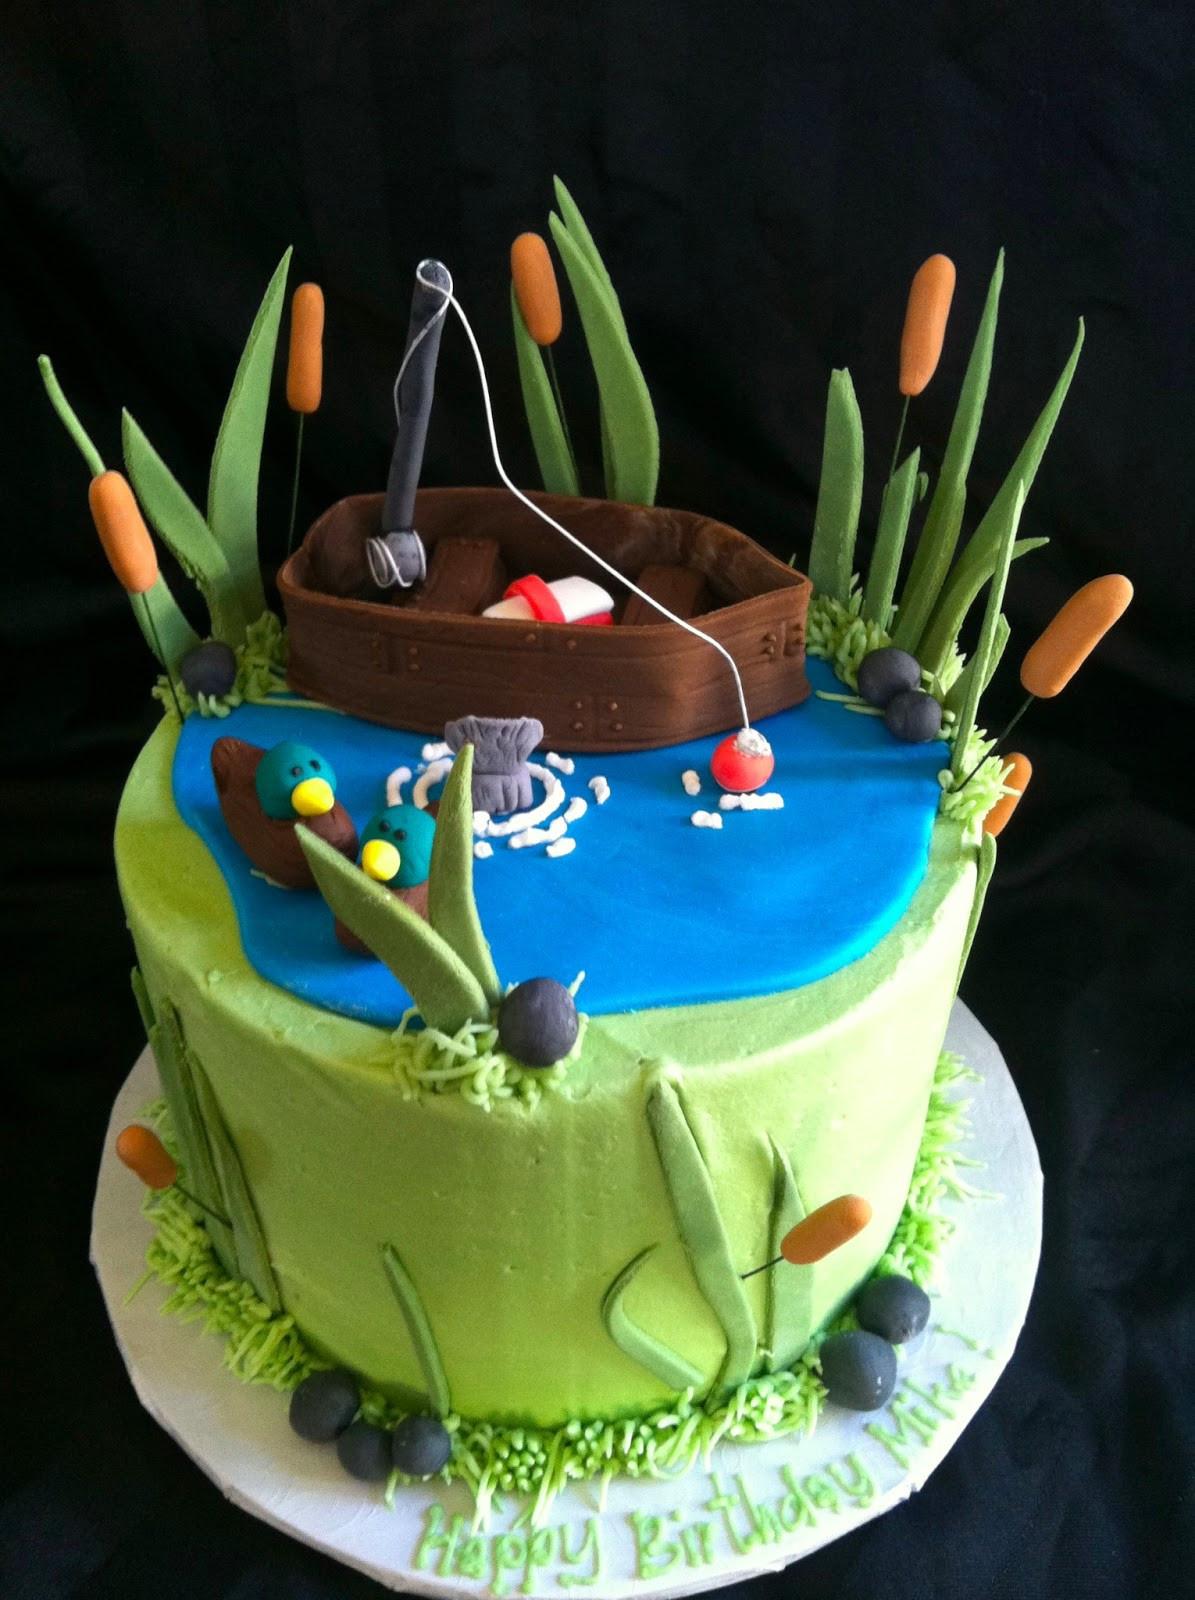 Fishing Birthday Cakes  A Little Something Sweet Small Gone Fishing Cake